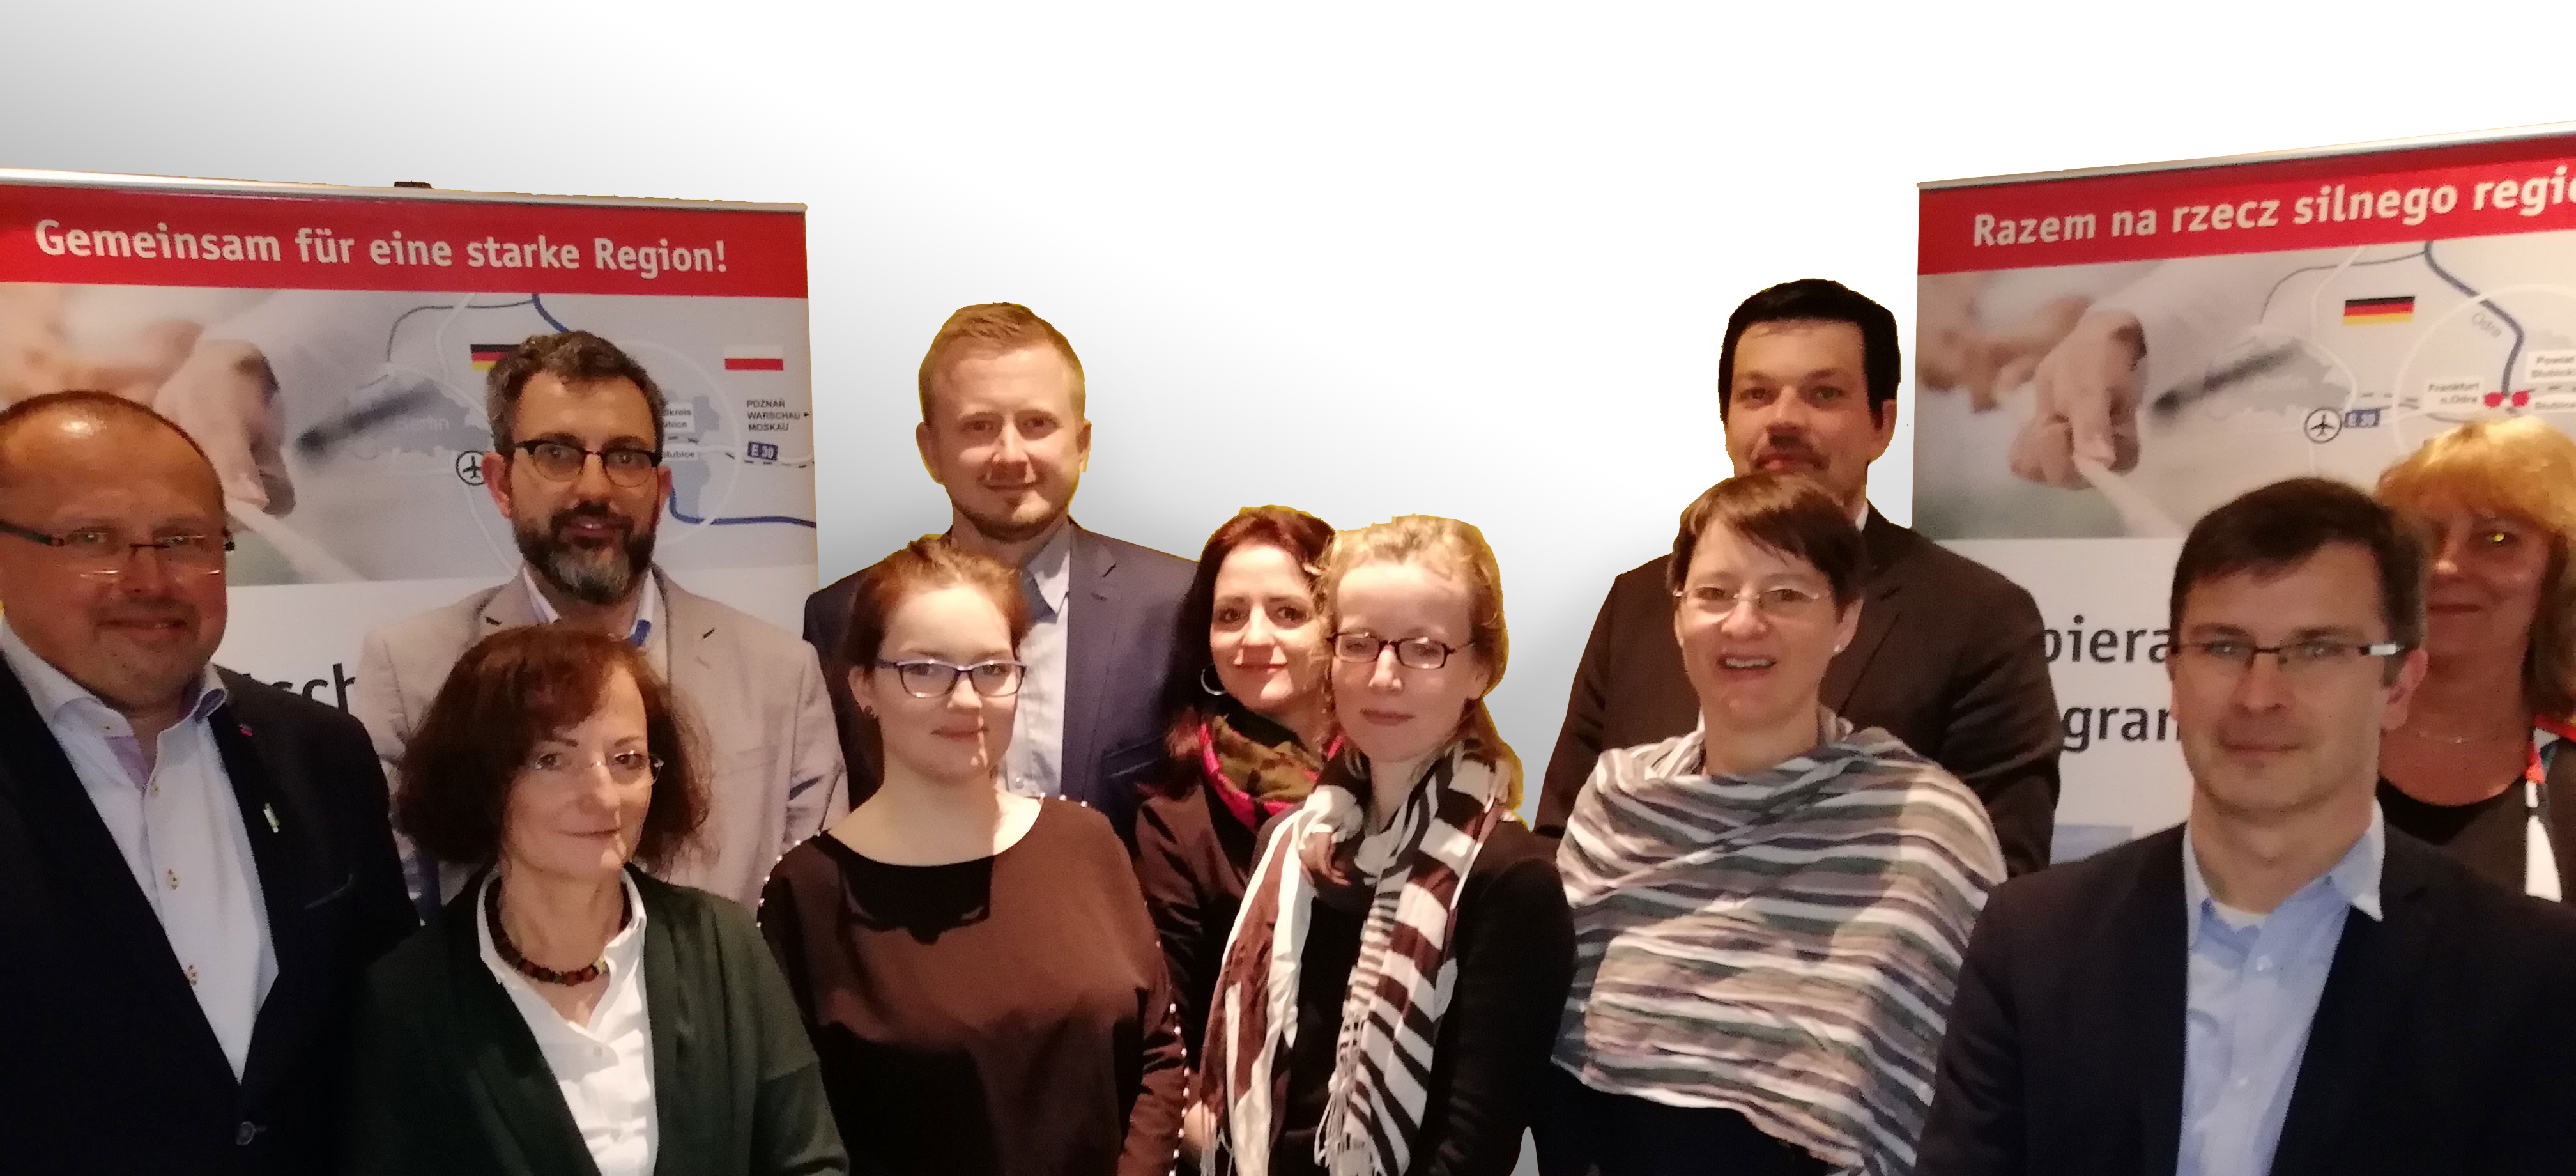 Gruppenbild sechster offizieller Arbeitskreis der Interreg-Projektgruppe